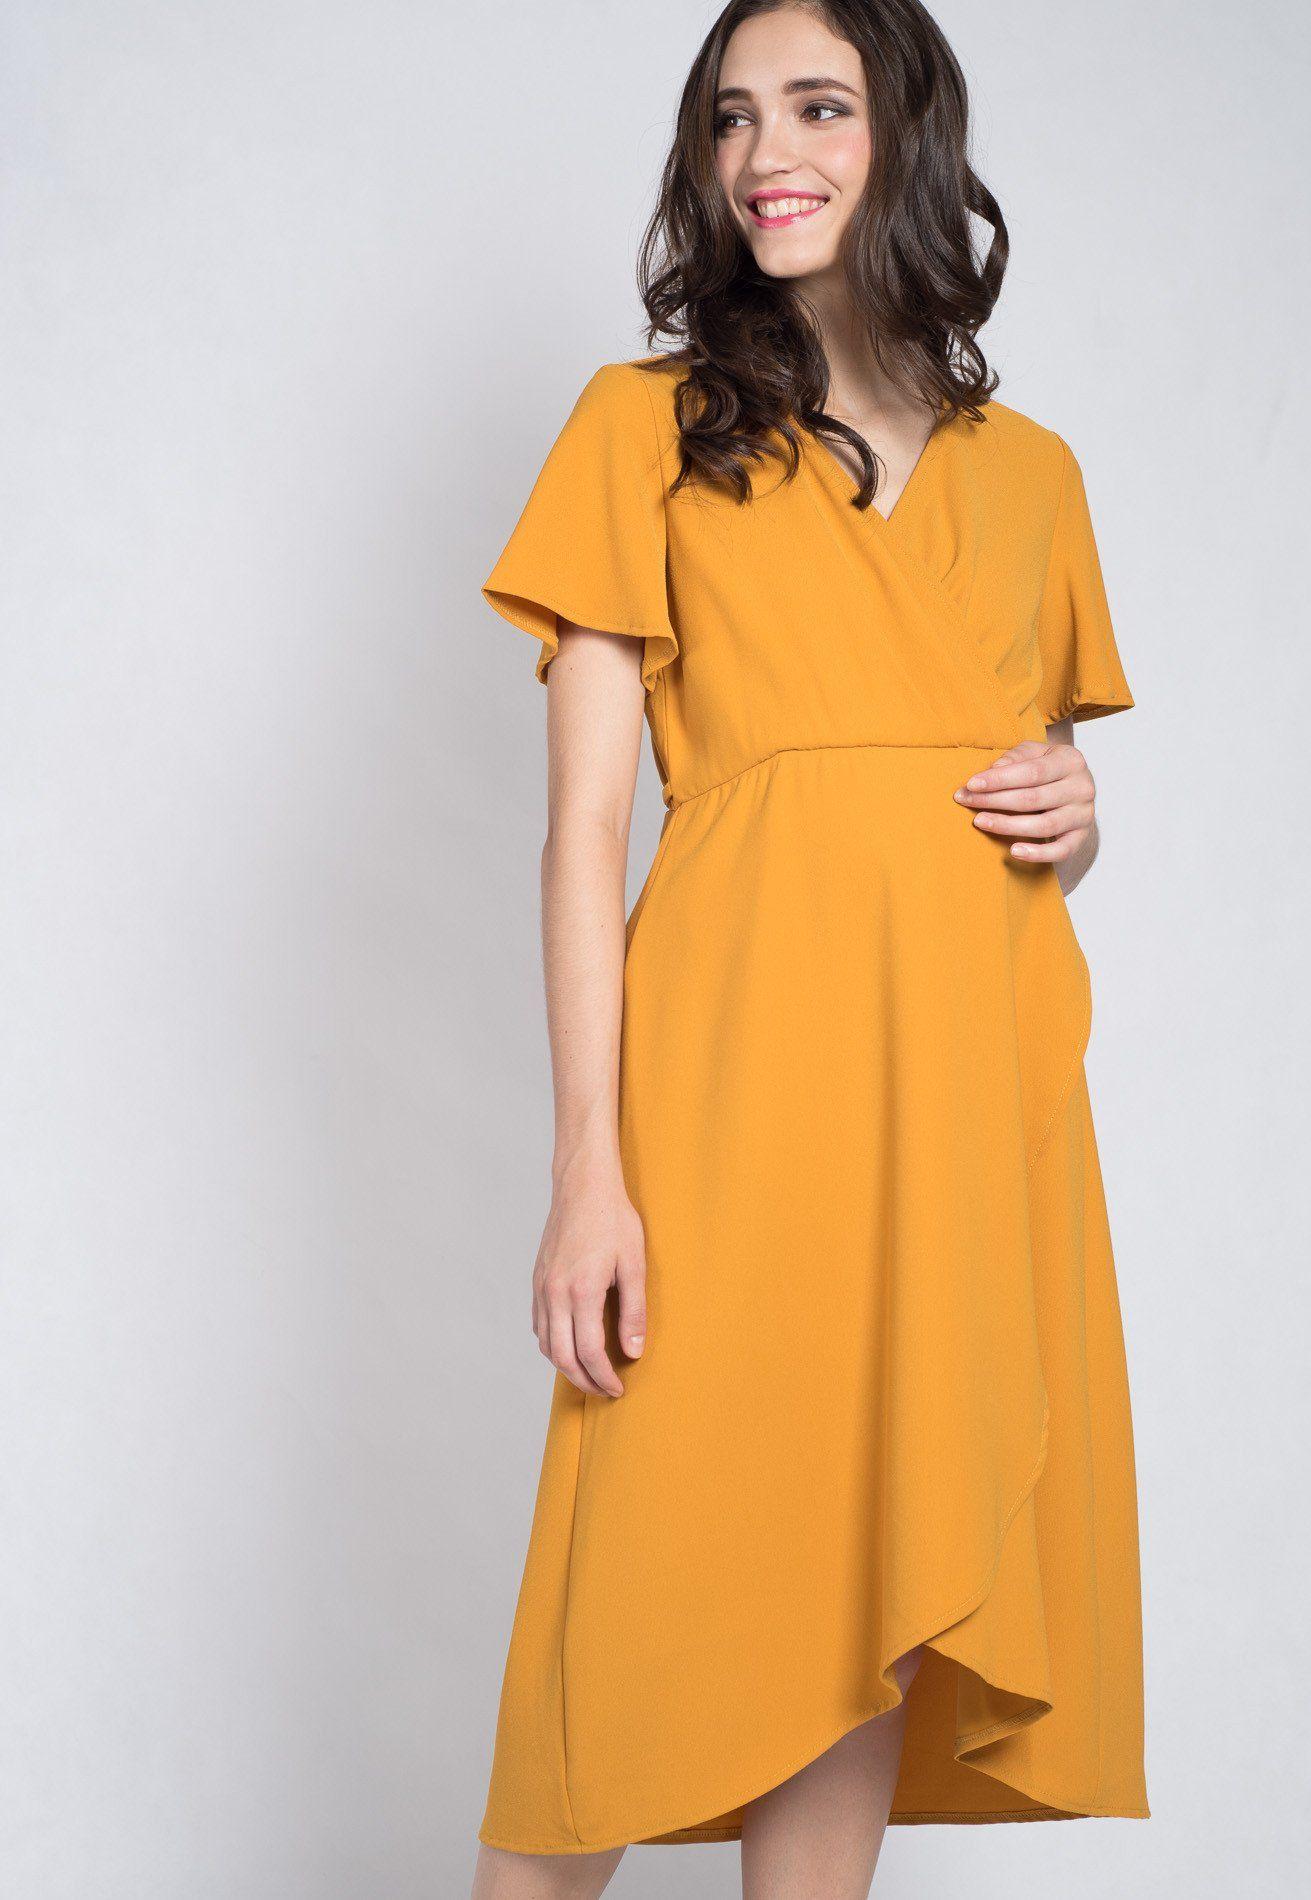 Mothercot Mustard Luciana Office Nursing Dress By Jumpeatcry Maternity And Nursing Wear Nursing Dress Dresses Short Sleeve Dresses [ 1900 x 1311 Pixel ]